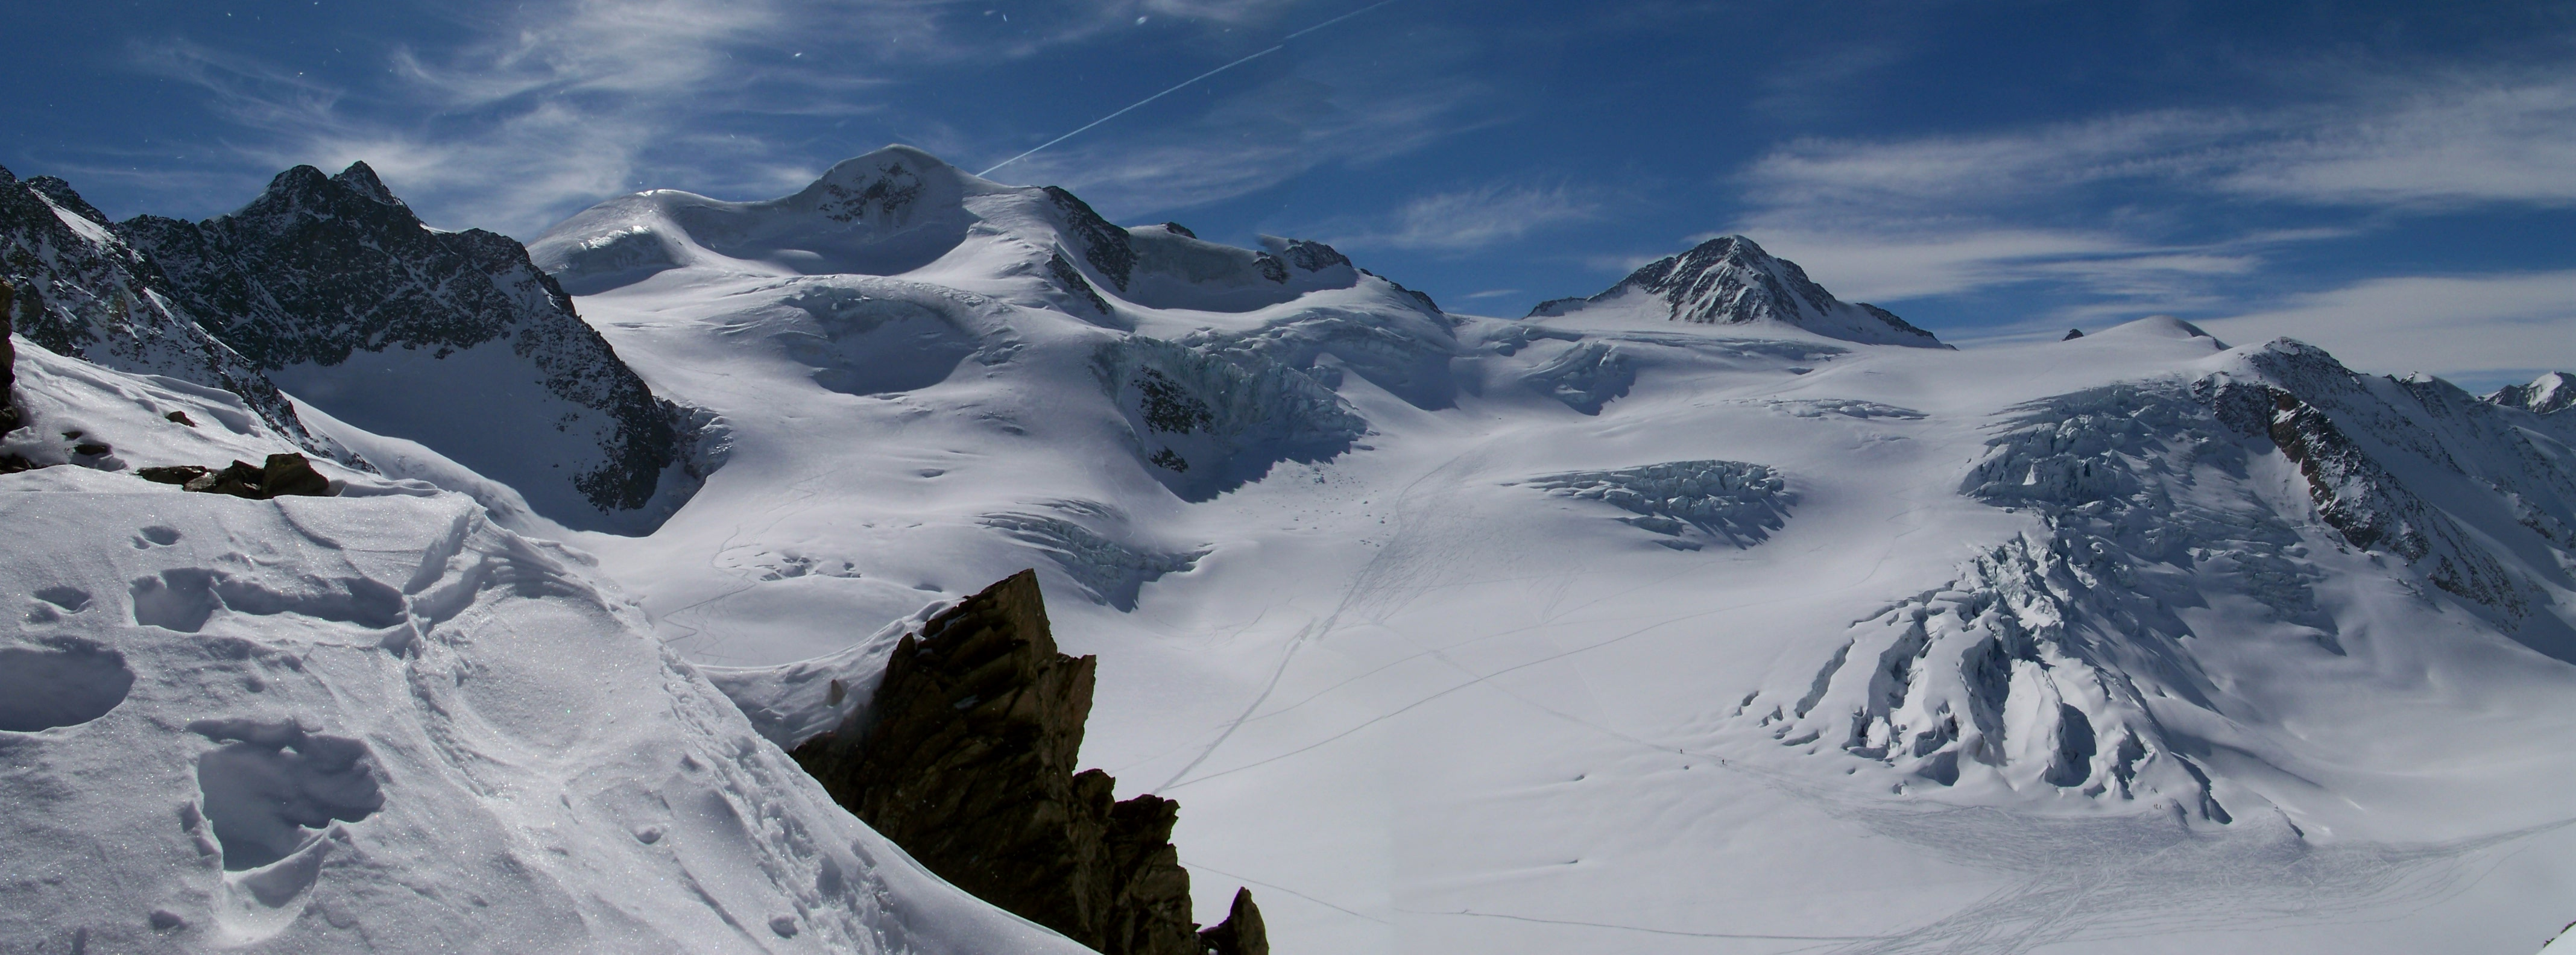 Wildspitze North Face, Pitztal Glacier